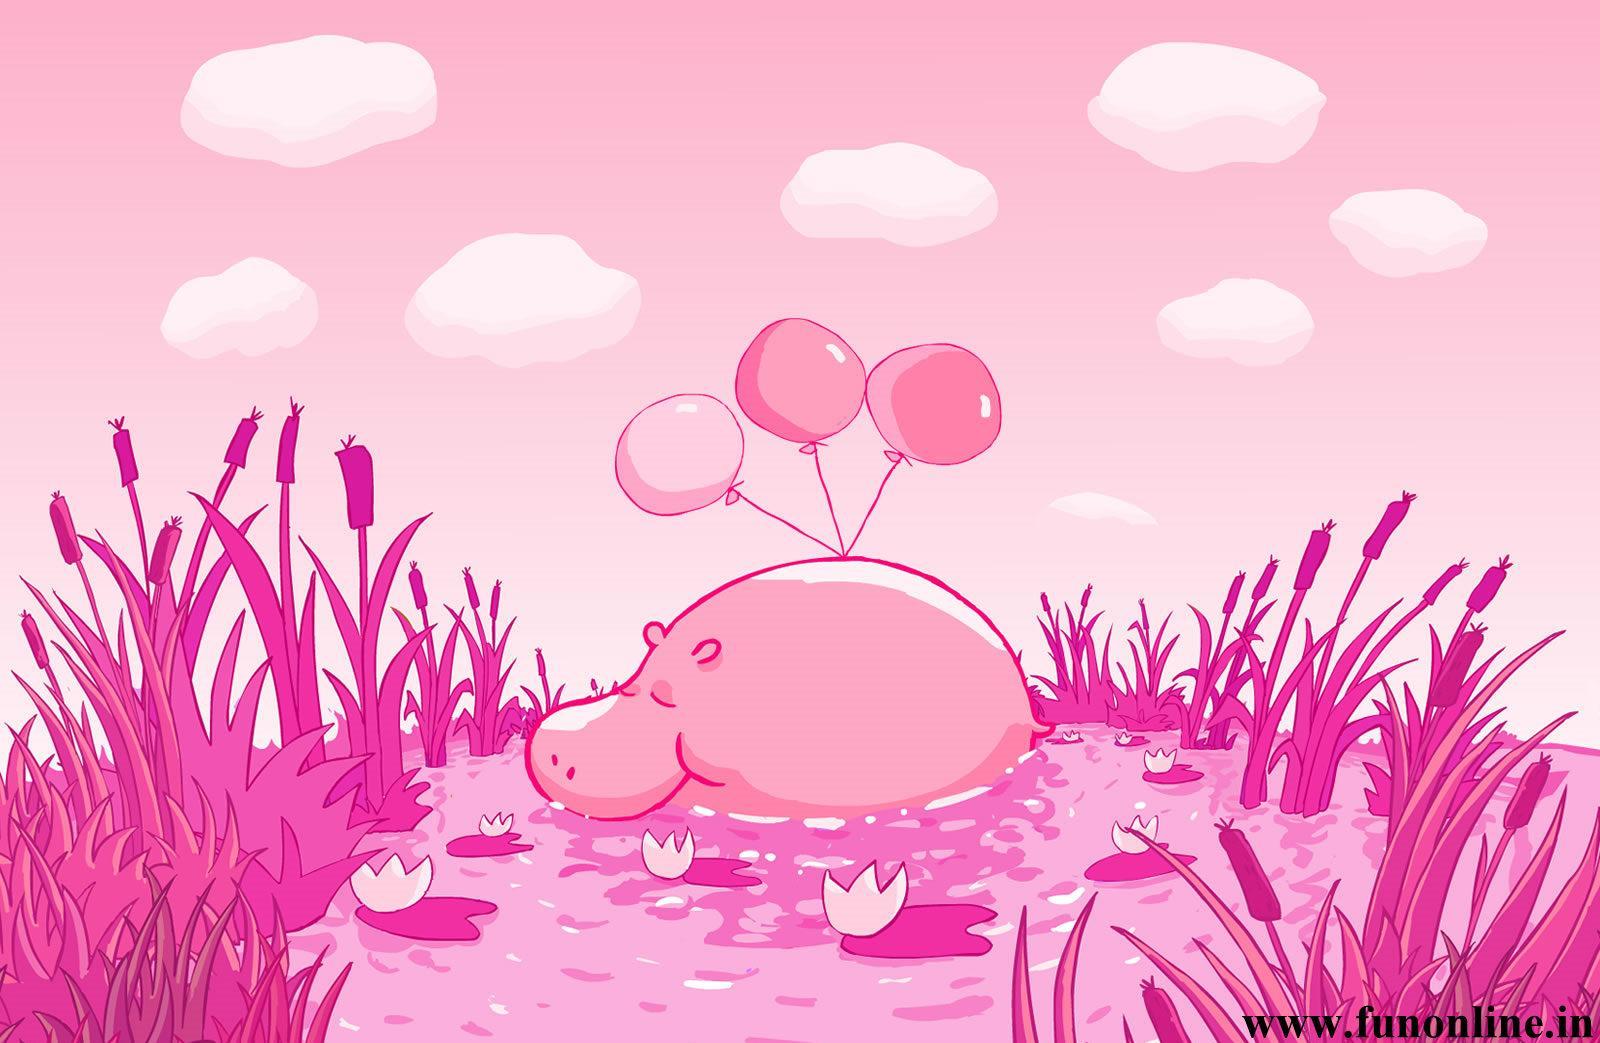 Hippopotamus Wallpapers Download Giant Hippos HD Wallpaper 1600x1043